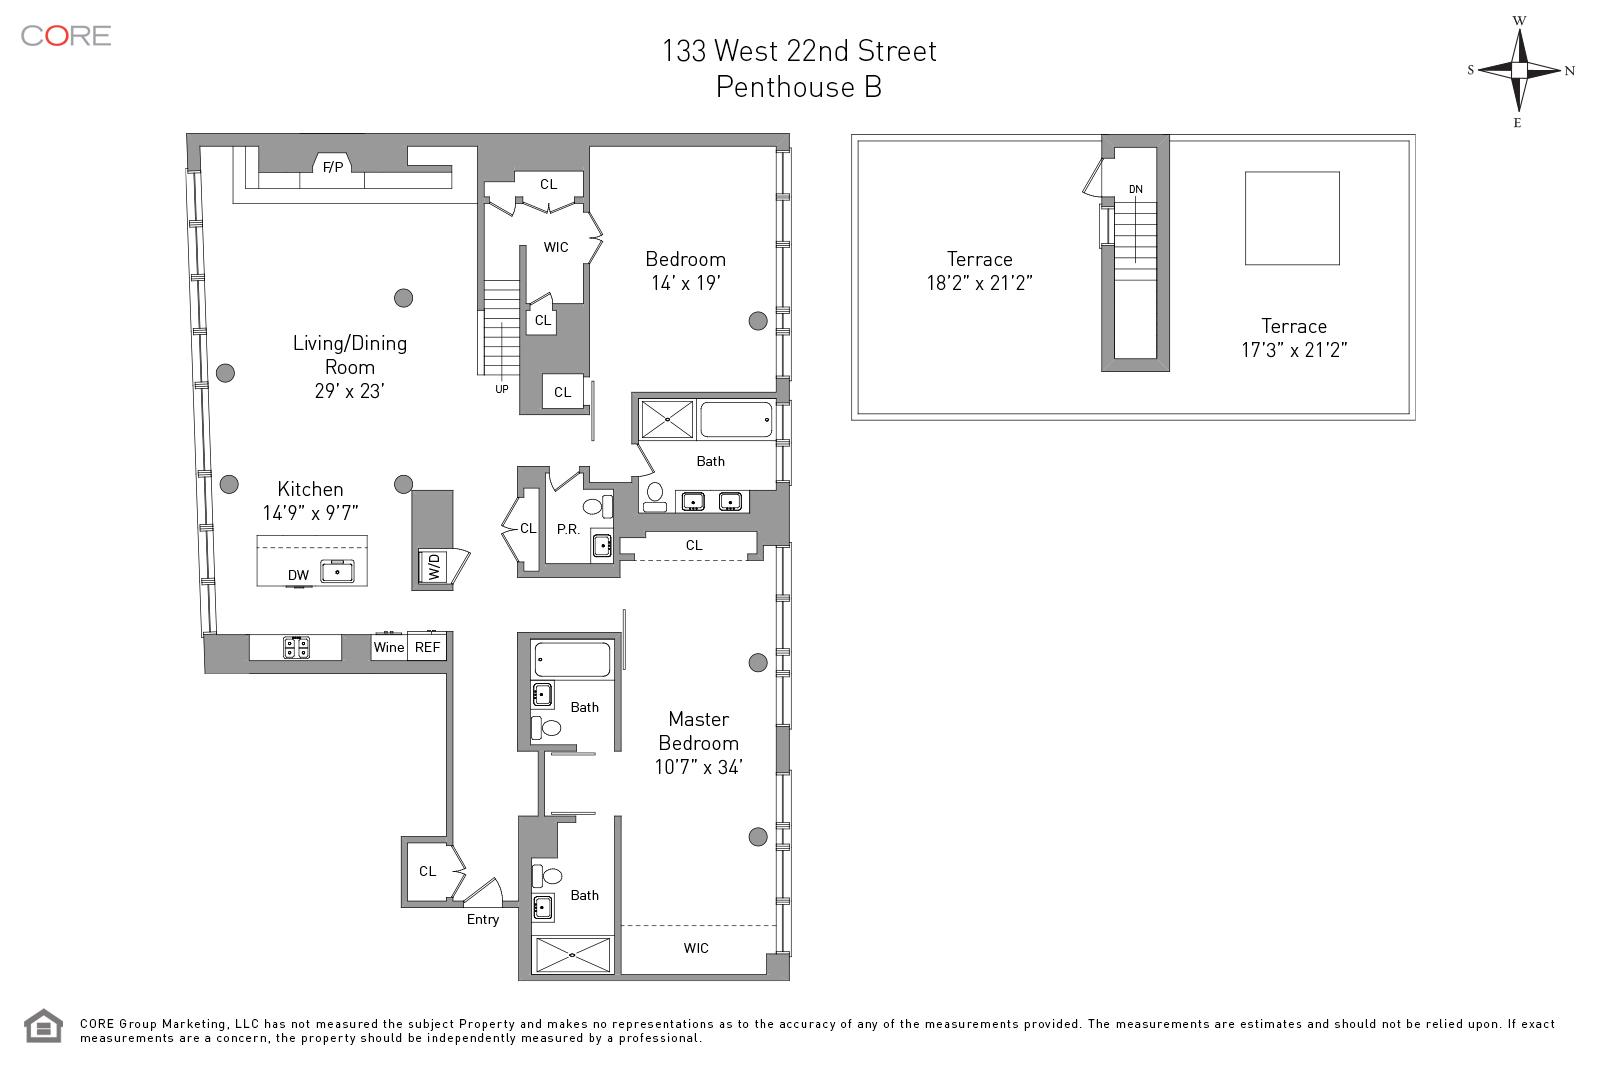 133 West 22nd St. PENTHOUSEB, New York, NY 10011